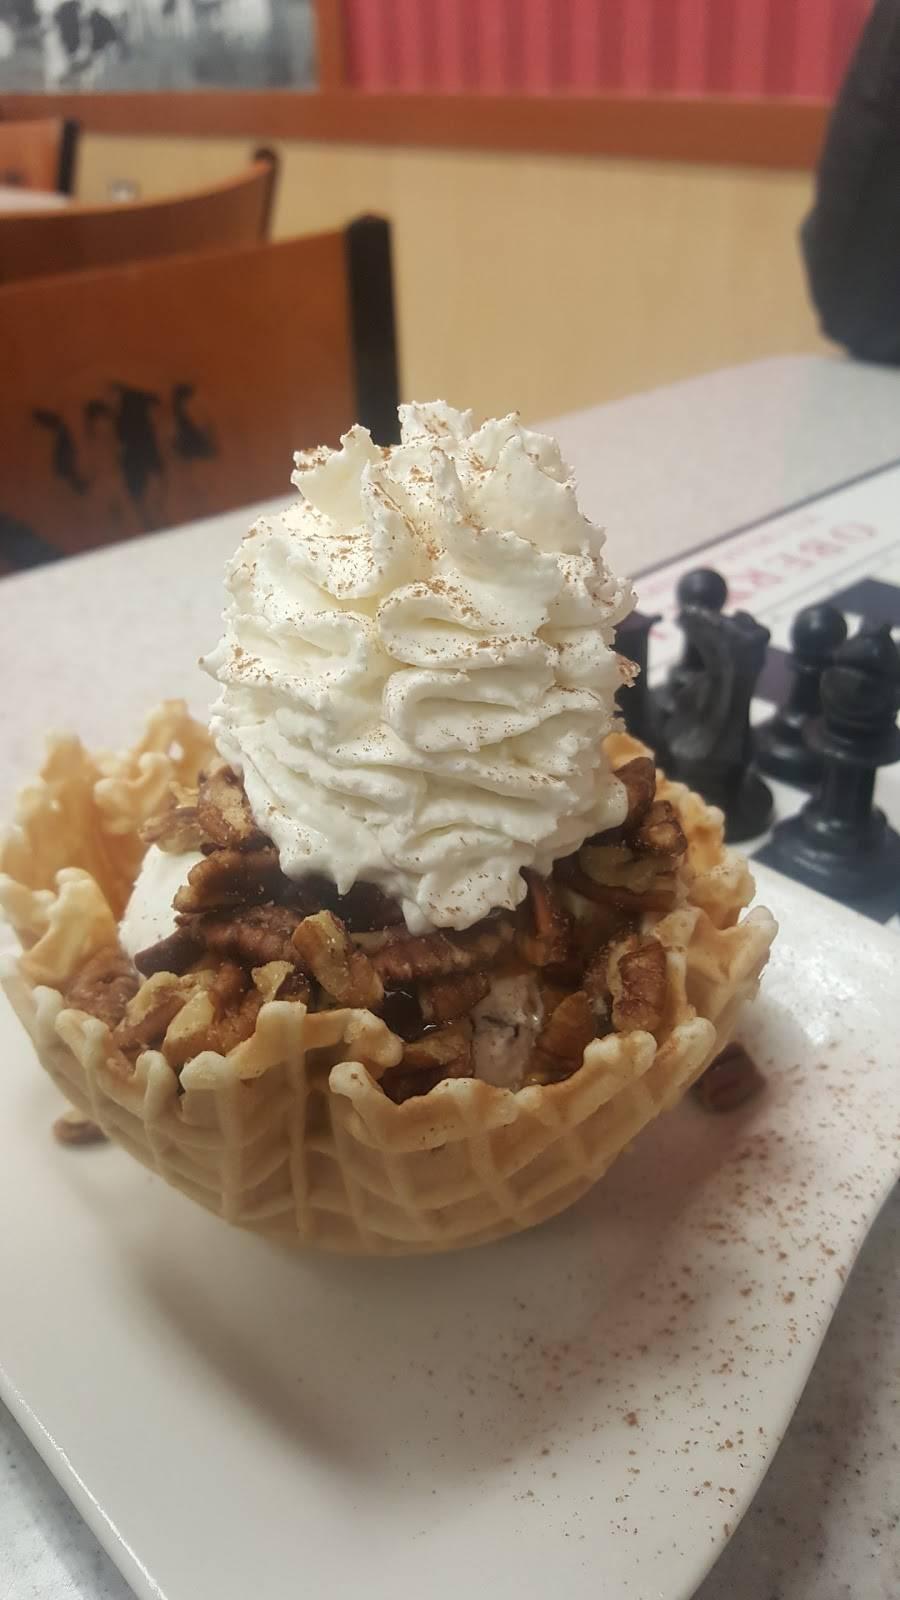 Oberweis Ice Cream and Dairy Store   restaurant   4811 Dempster Street, Skokie, IL 60077, USA   2245347429 OR +1 224-534-7429